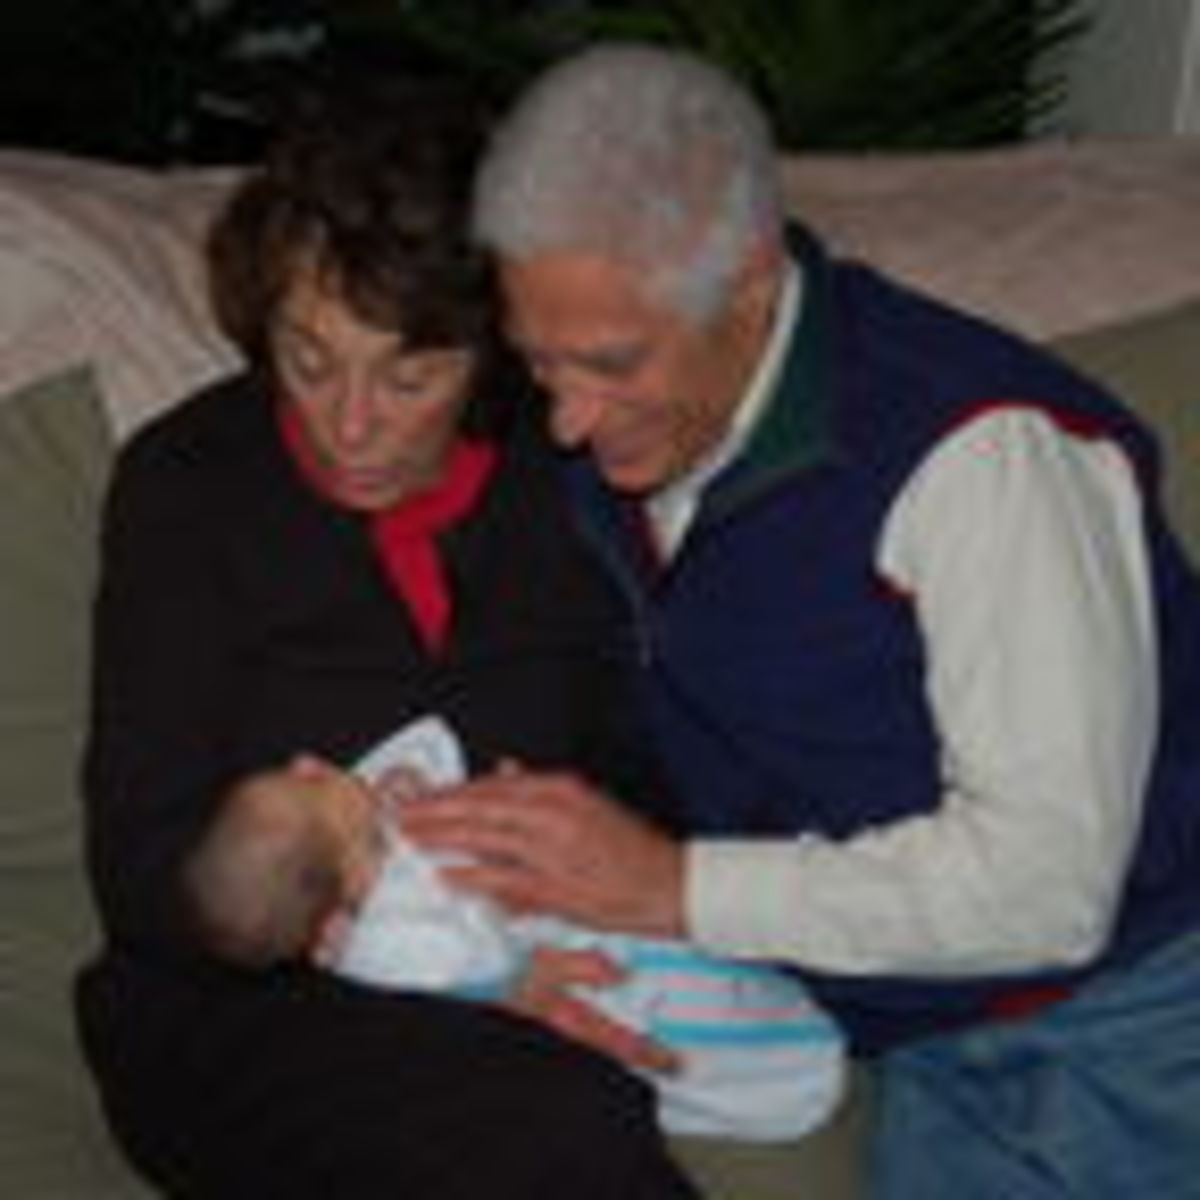 Hateful, Abusive, Neglectful Parent, or Doting Grandparent